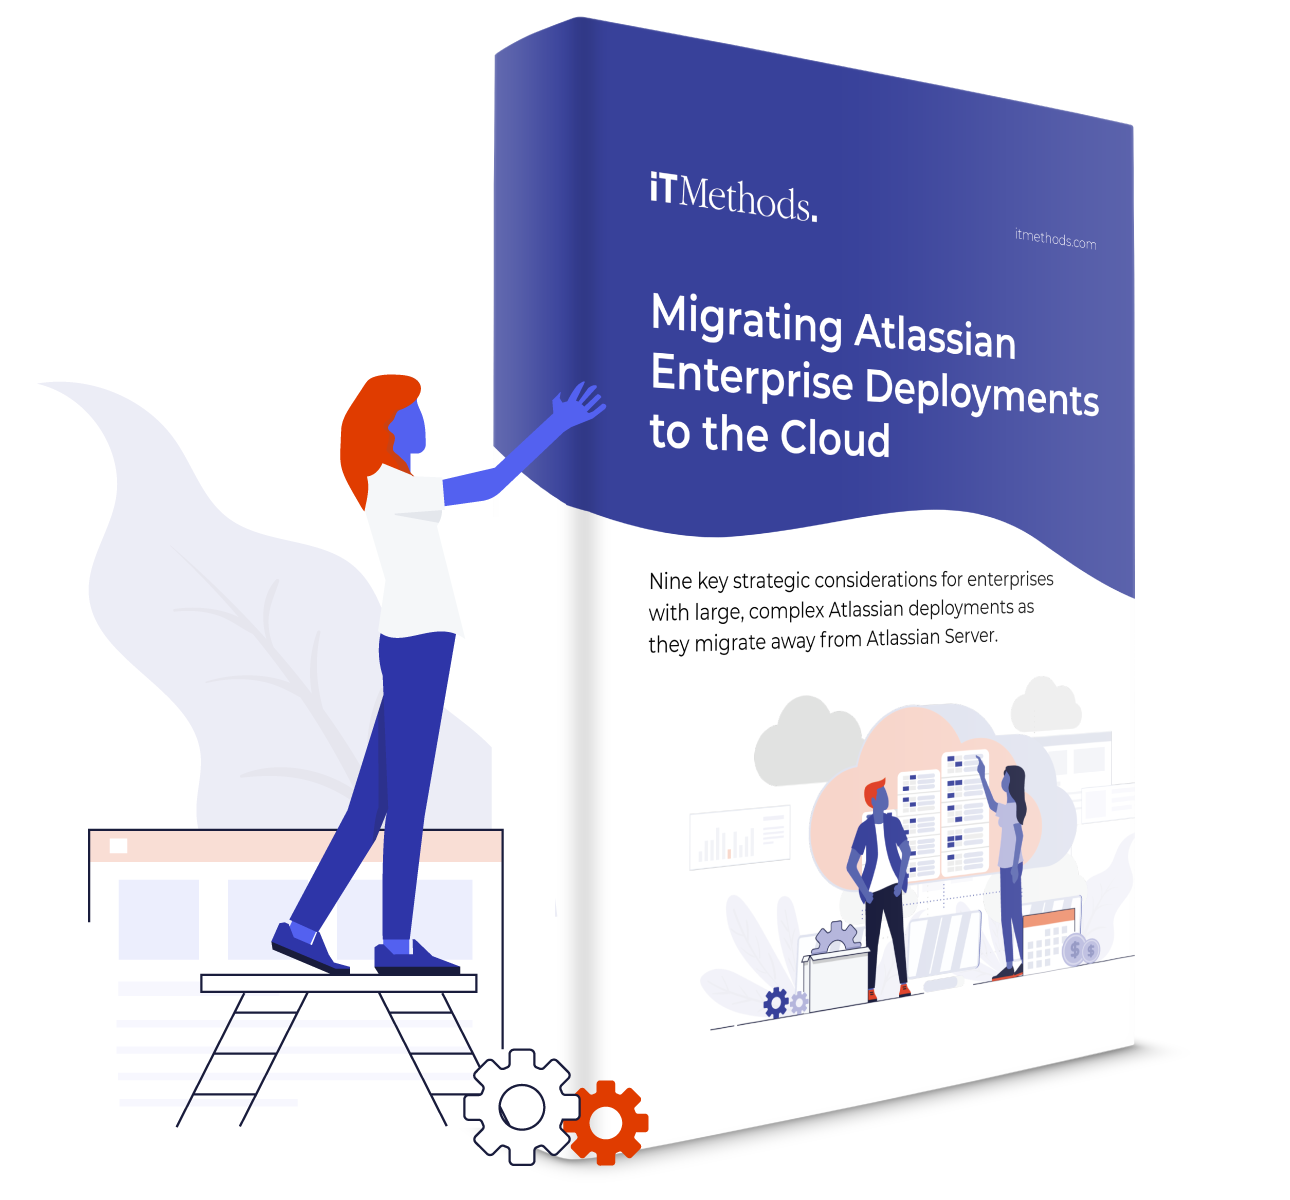 Migrating Atlassian Entterprise Deployments to the Cloud whitepaper